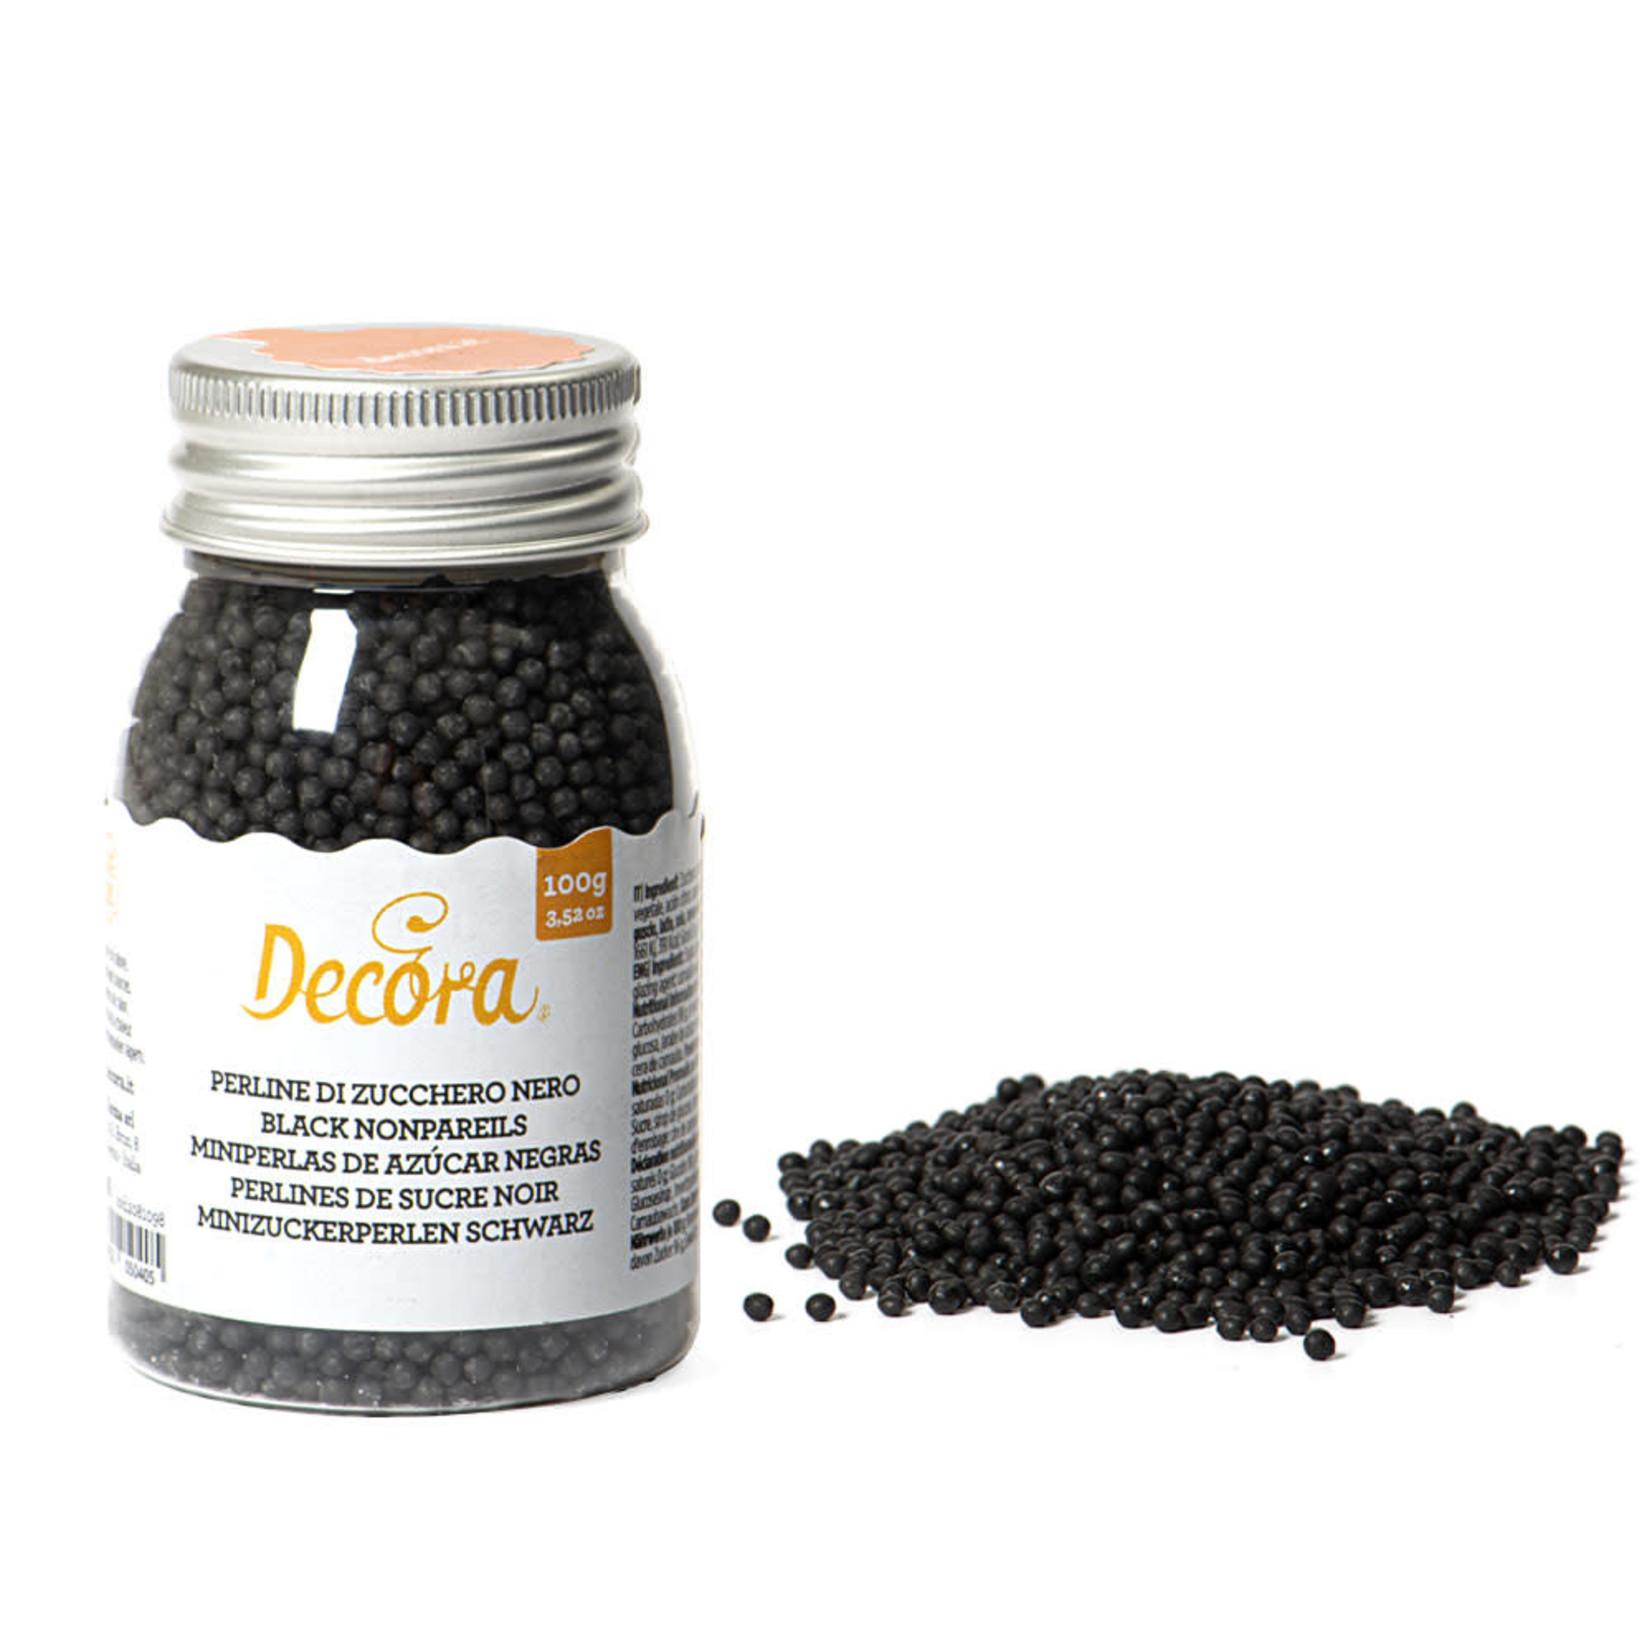 Decora pareltjes zwart 100g